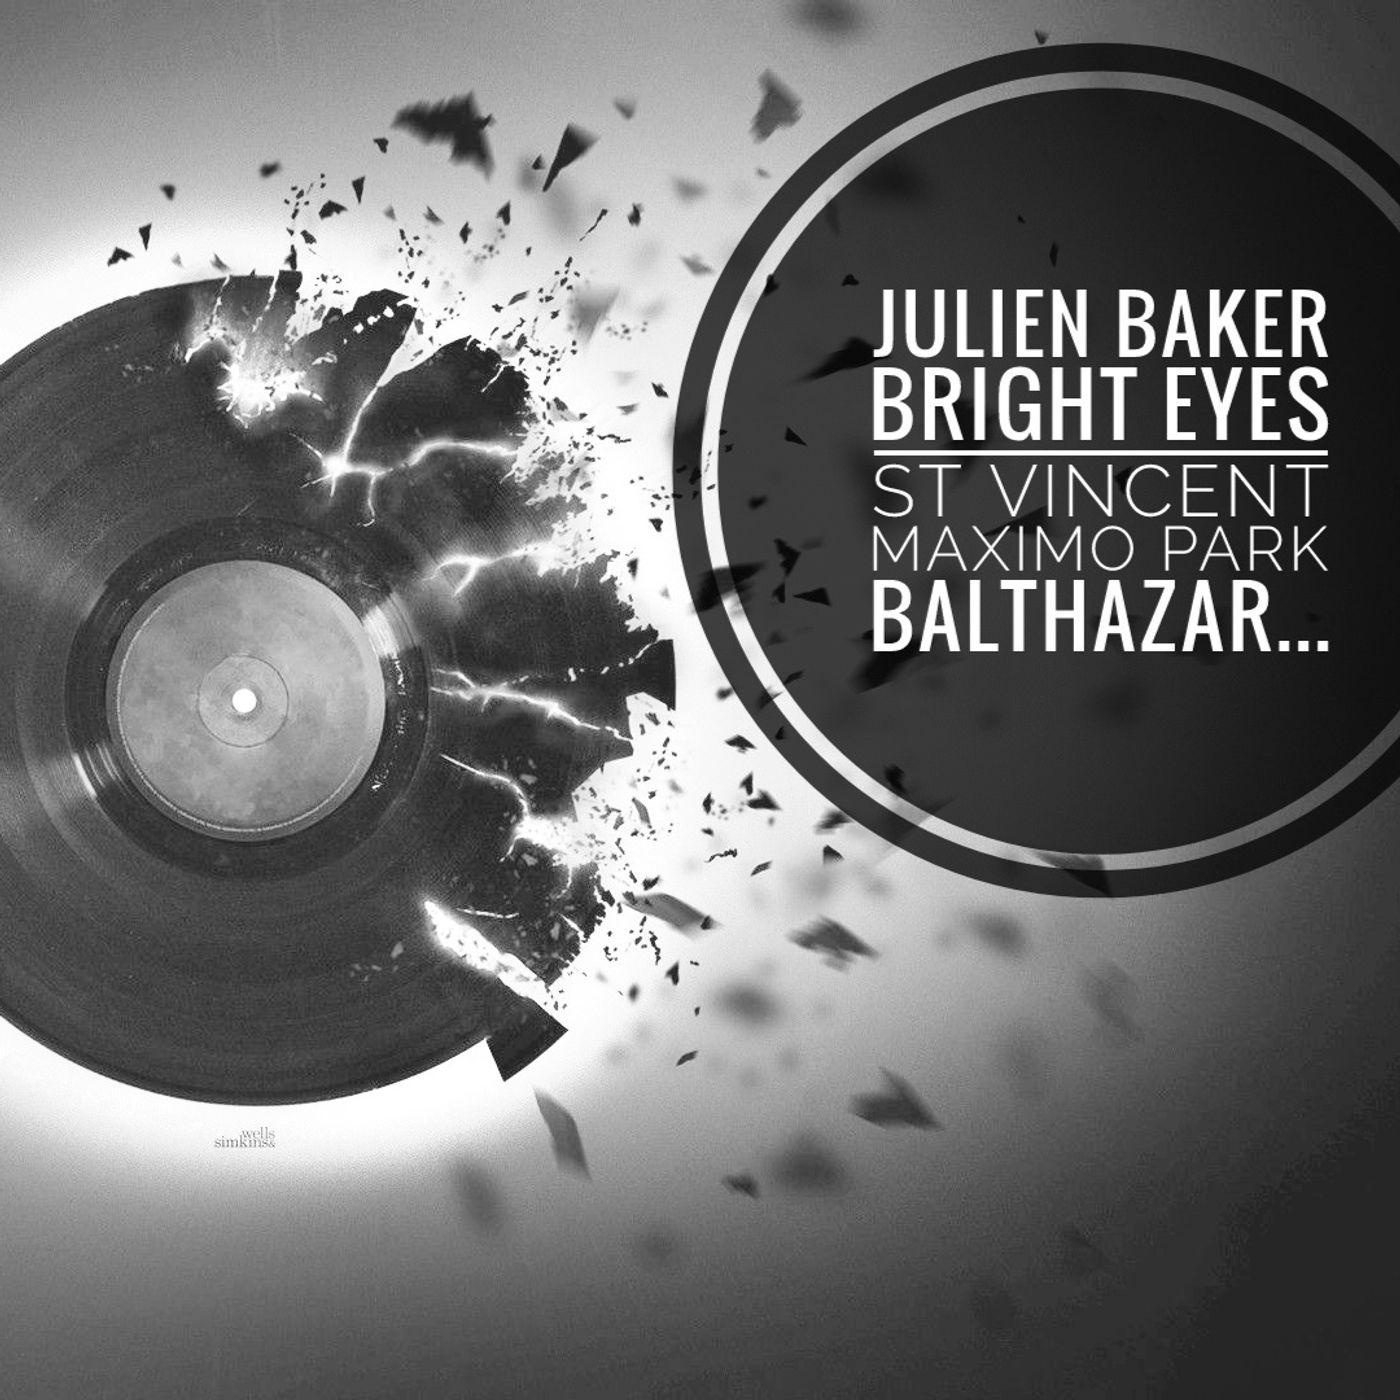 Julien Baker, St Vincent, Maximo Park , Bright Eyes - Propaganda S4e23